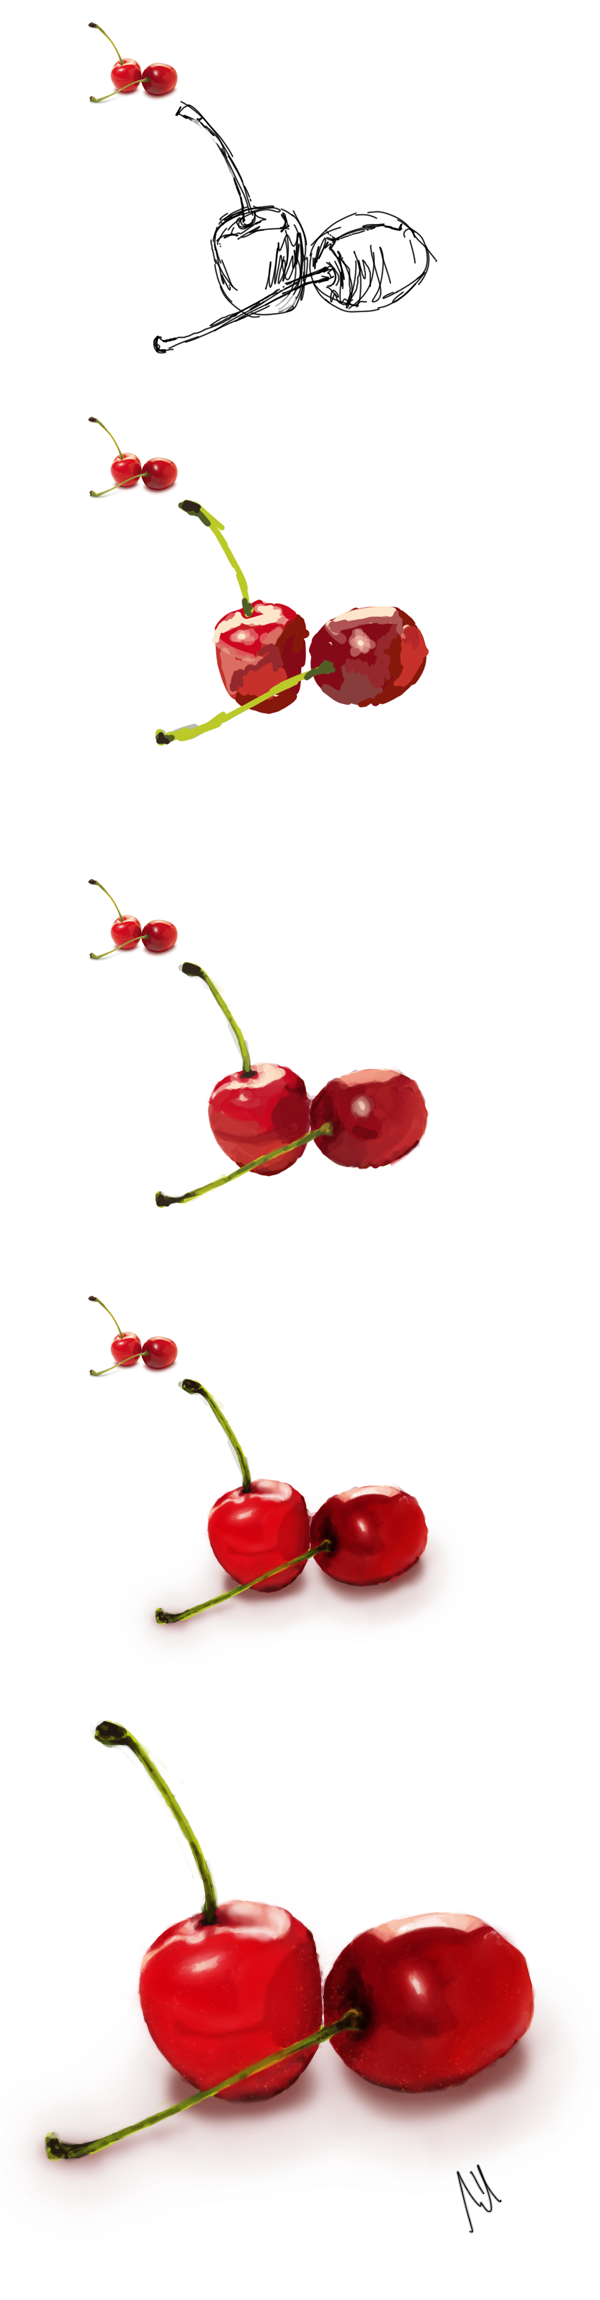 Cherry by Artush